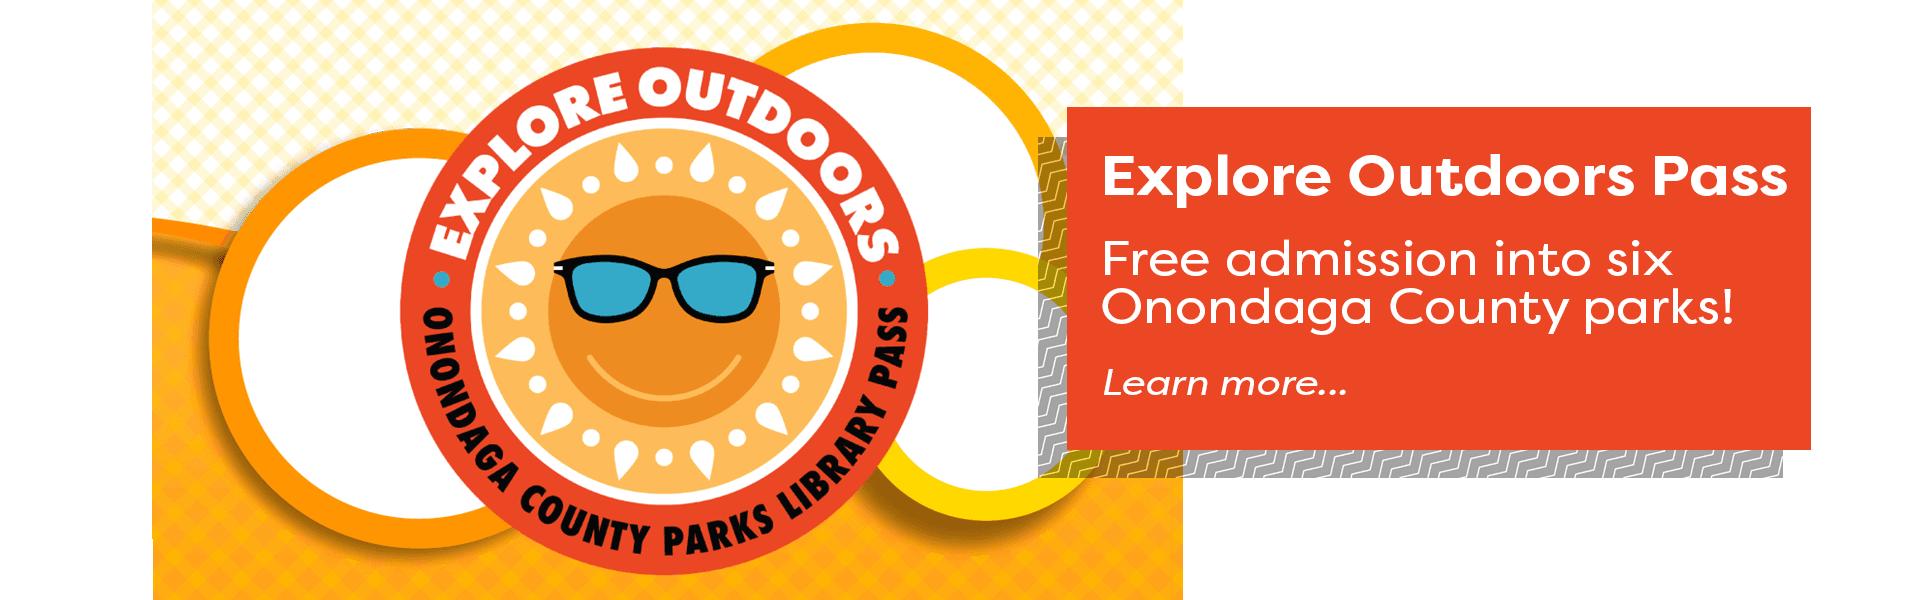 Onondaga County Explore Outdoors Pass